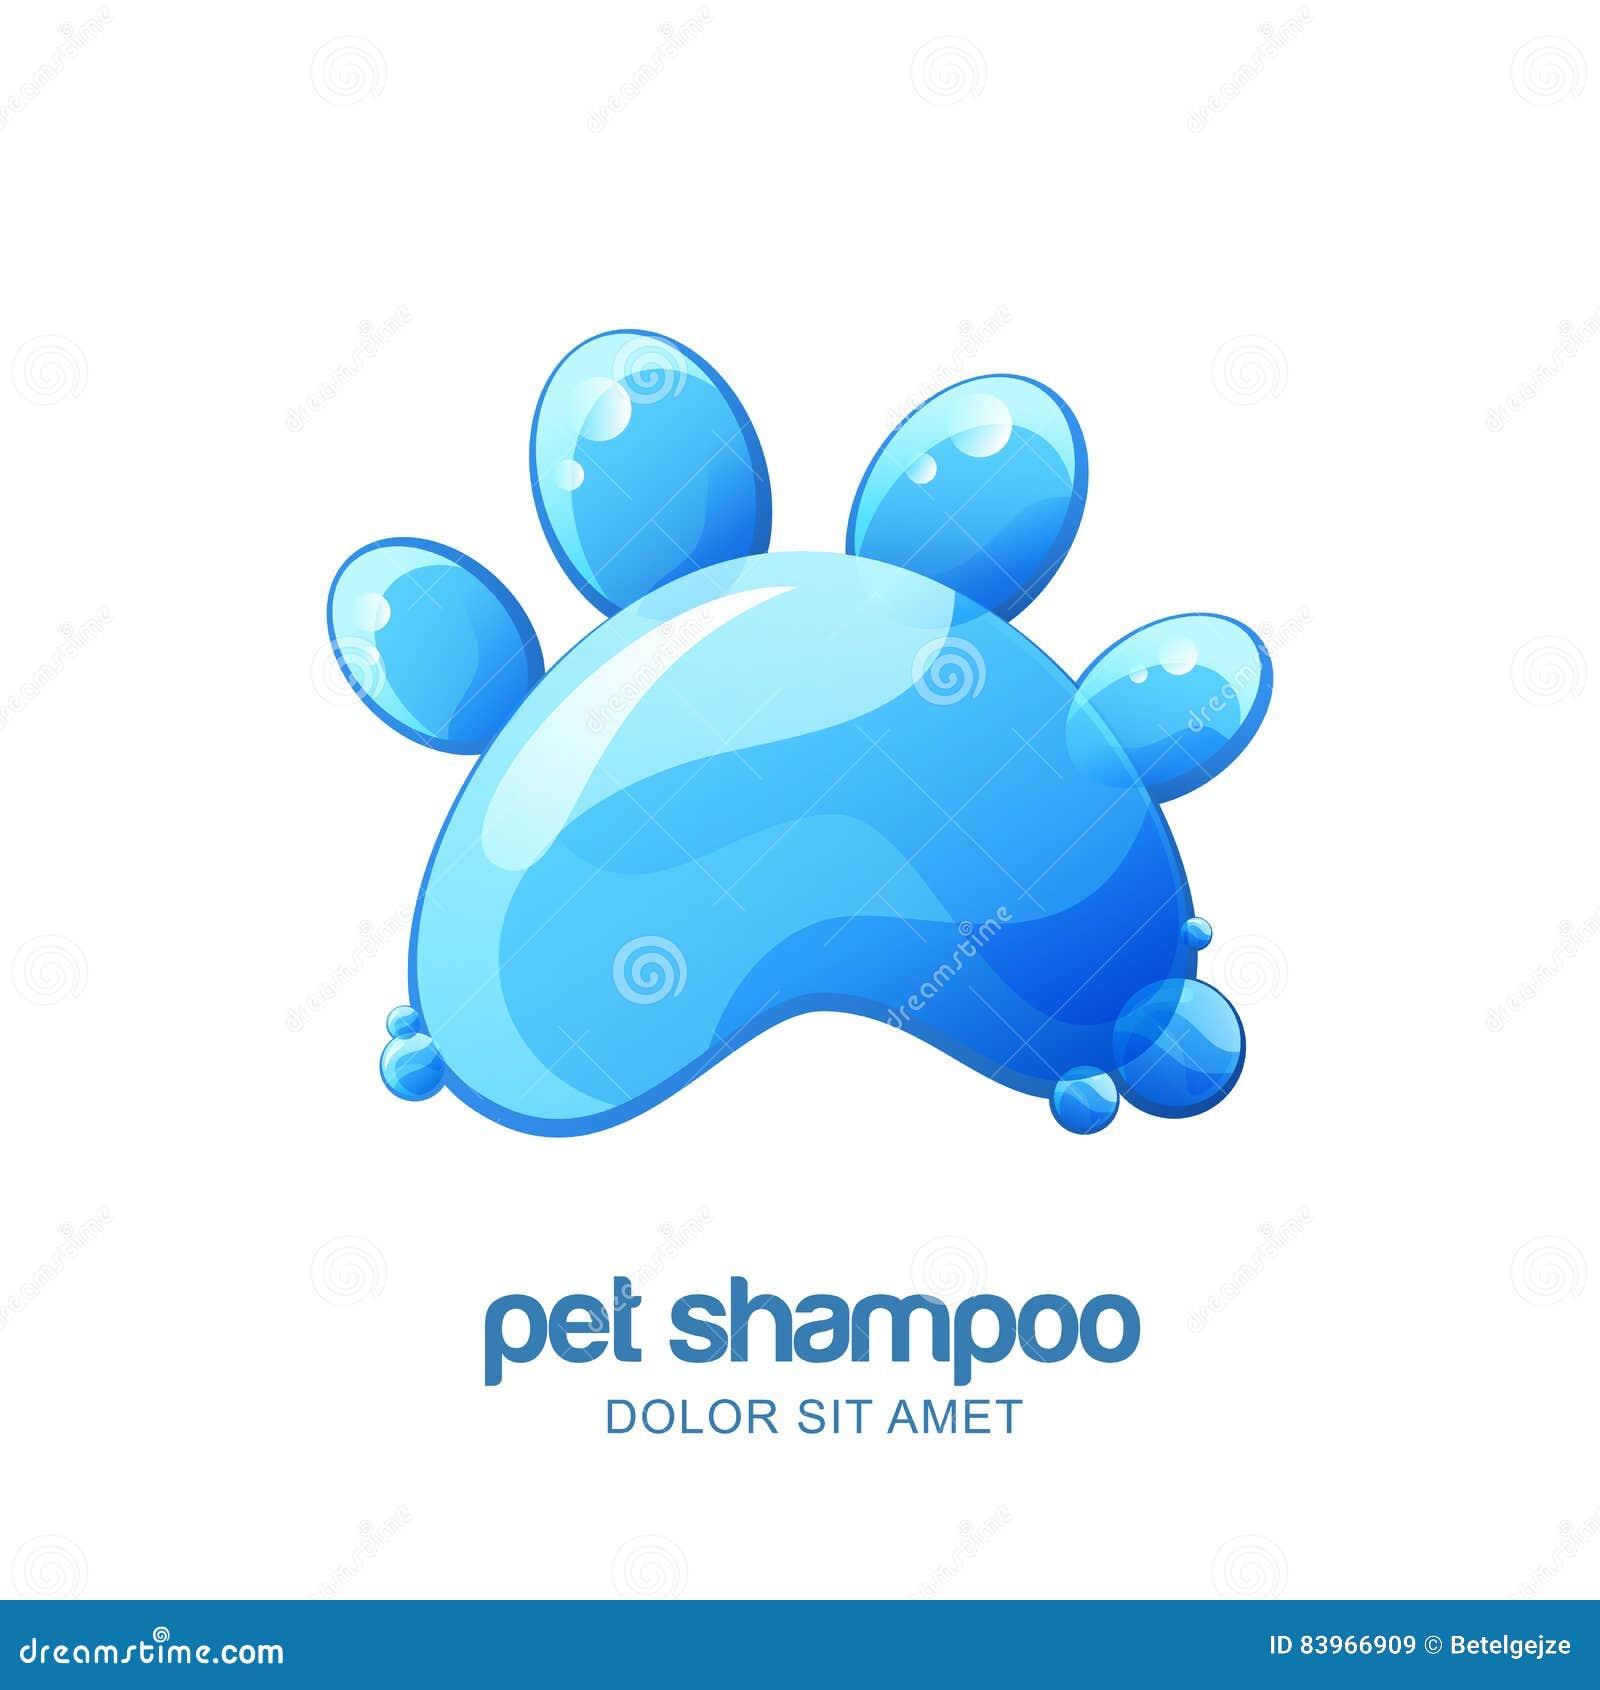 Vector Logo, Emblem, Label Design Elements For Pet Shampoo